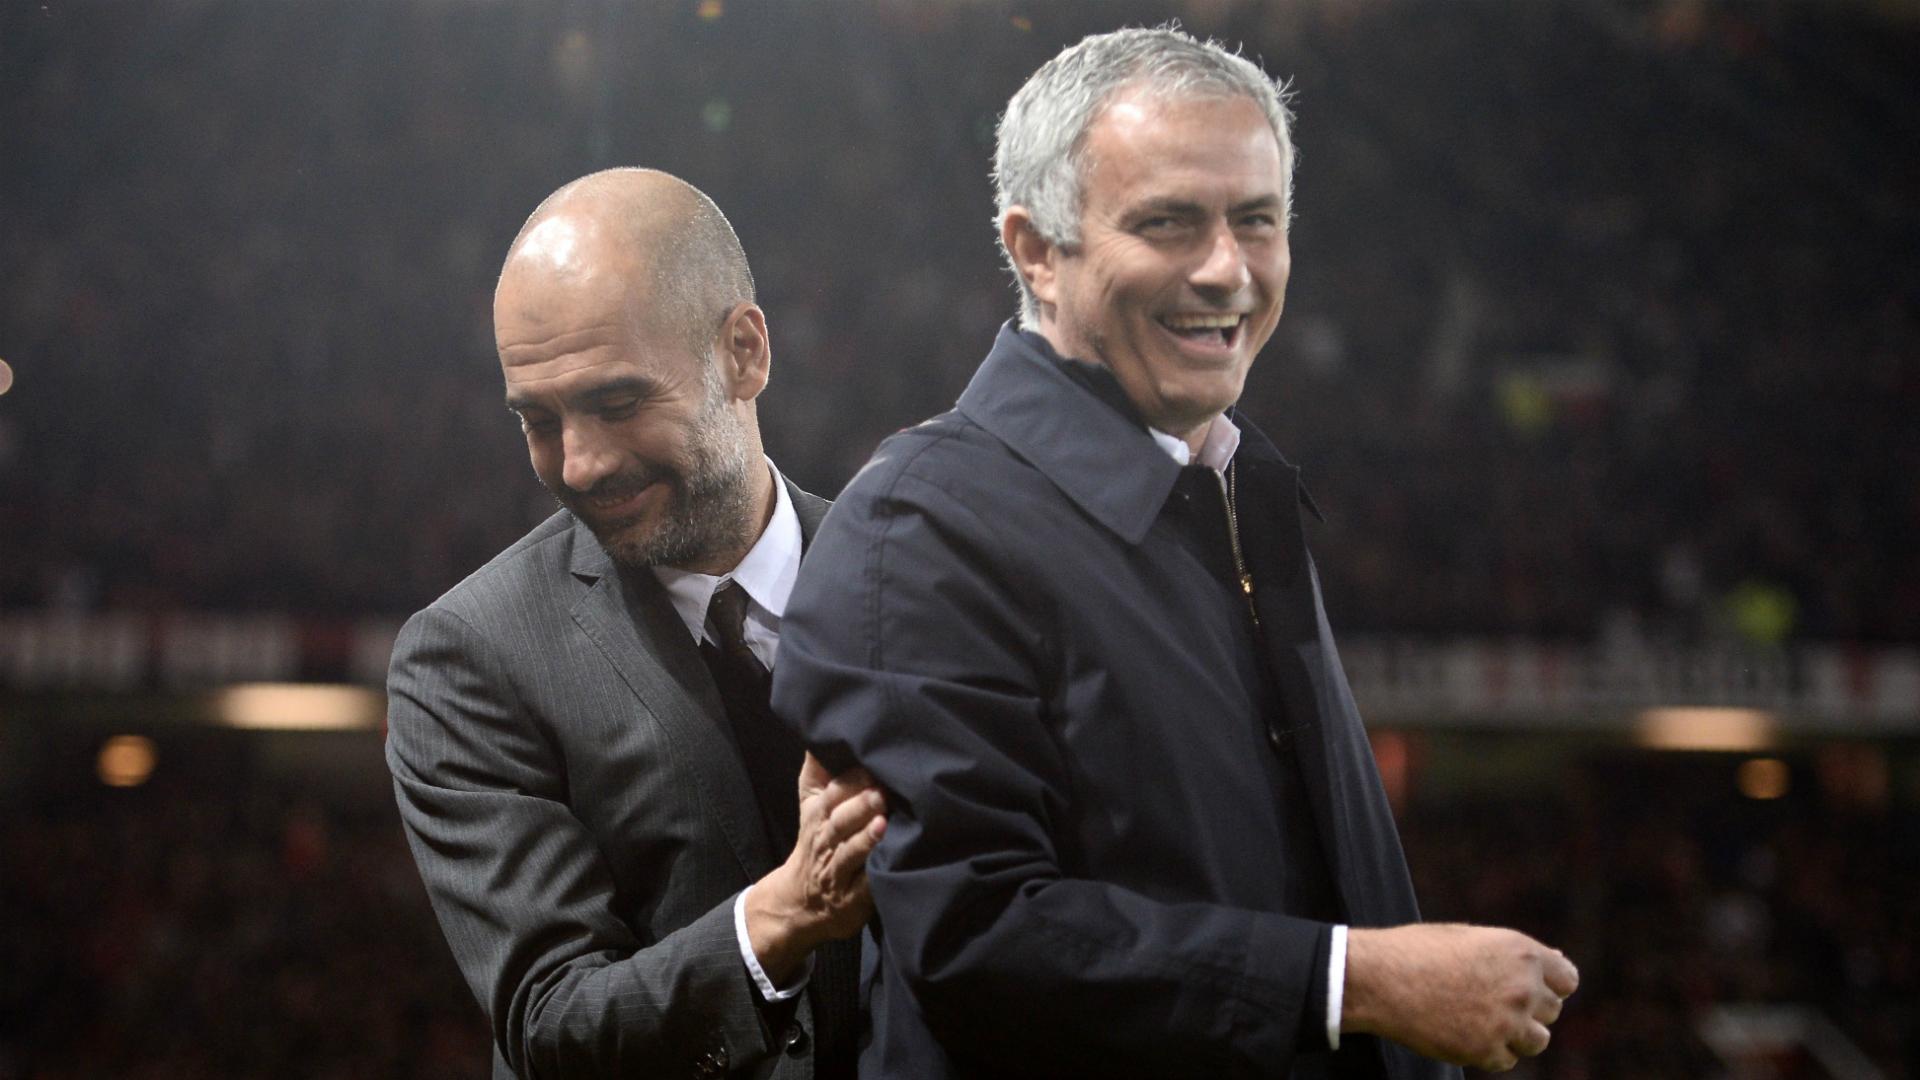 Pep-guardiola-jose-mourinho-manchester-city-manchester-united_1pofrczzfxj51q2xb05et5ifo